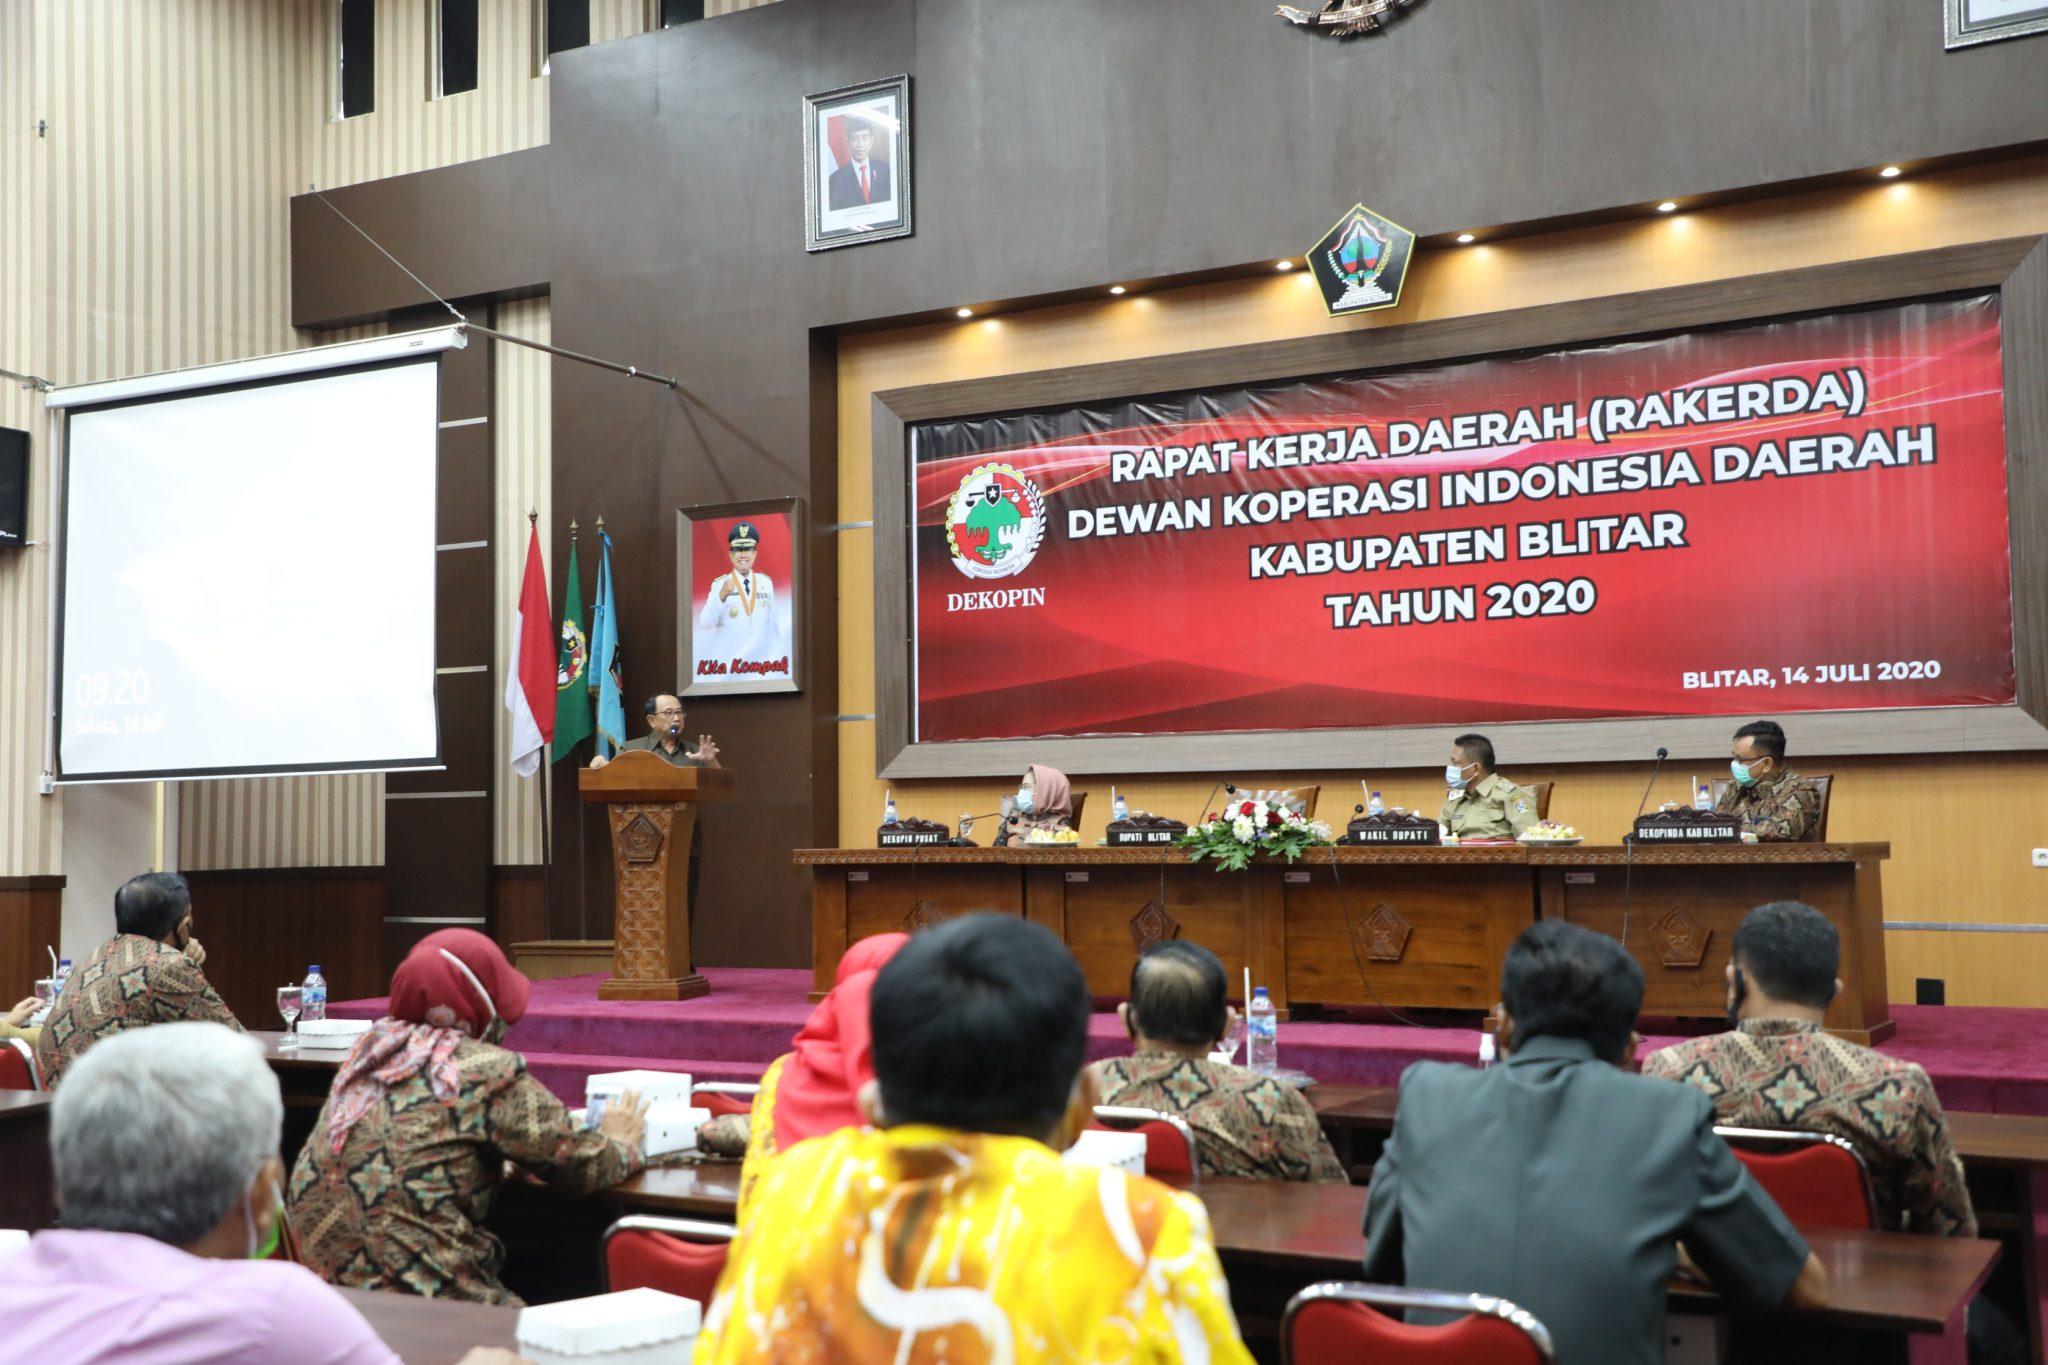 Pemkab Blitar Gelar Rakerda Dekopinda Kabupaten Blitar